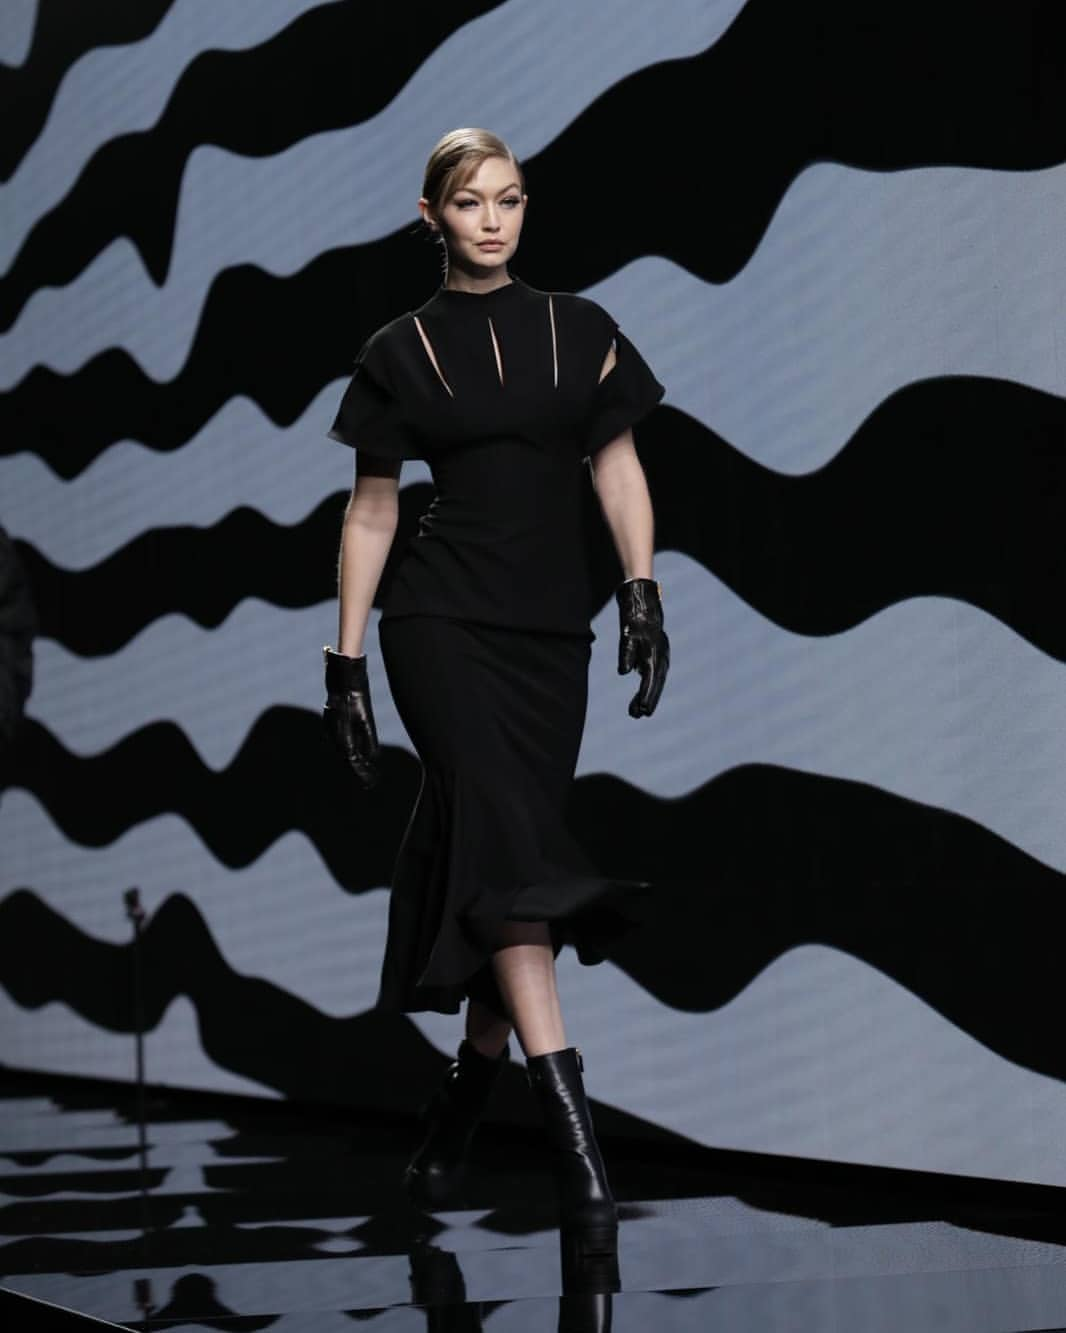 Gigi Hadid per Versace - Neomag.